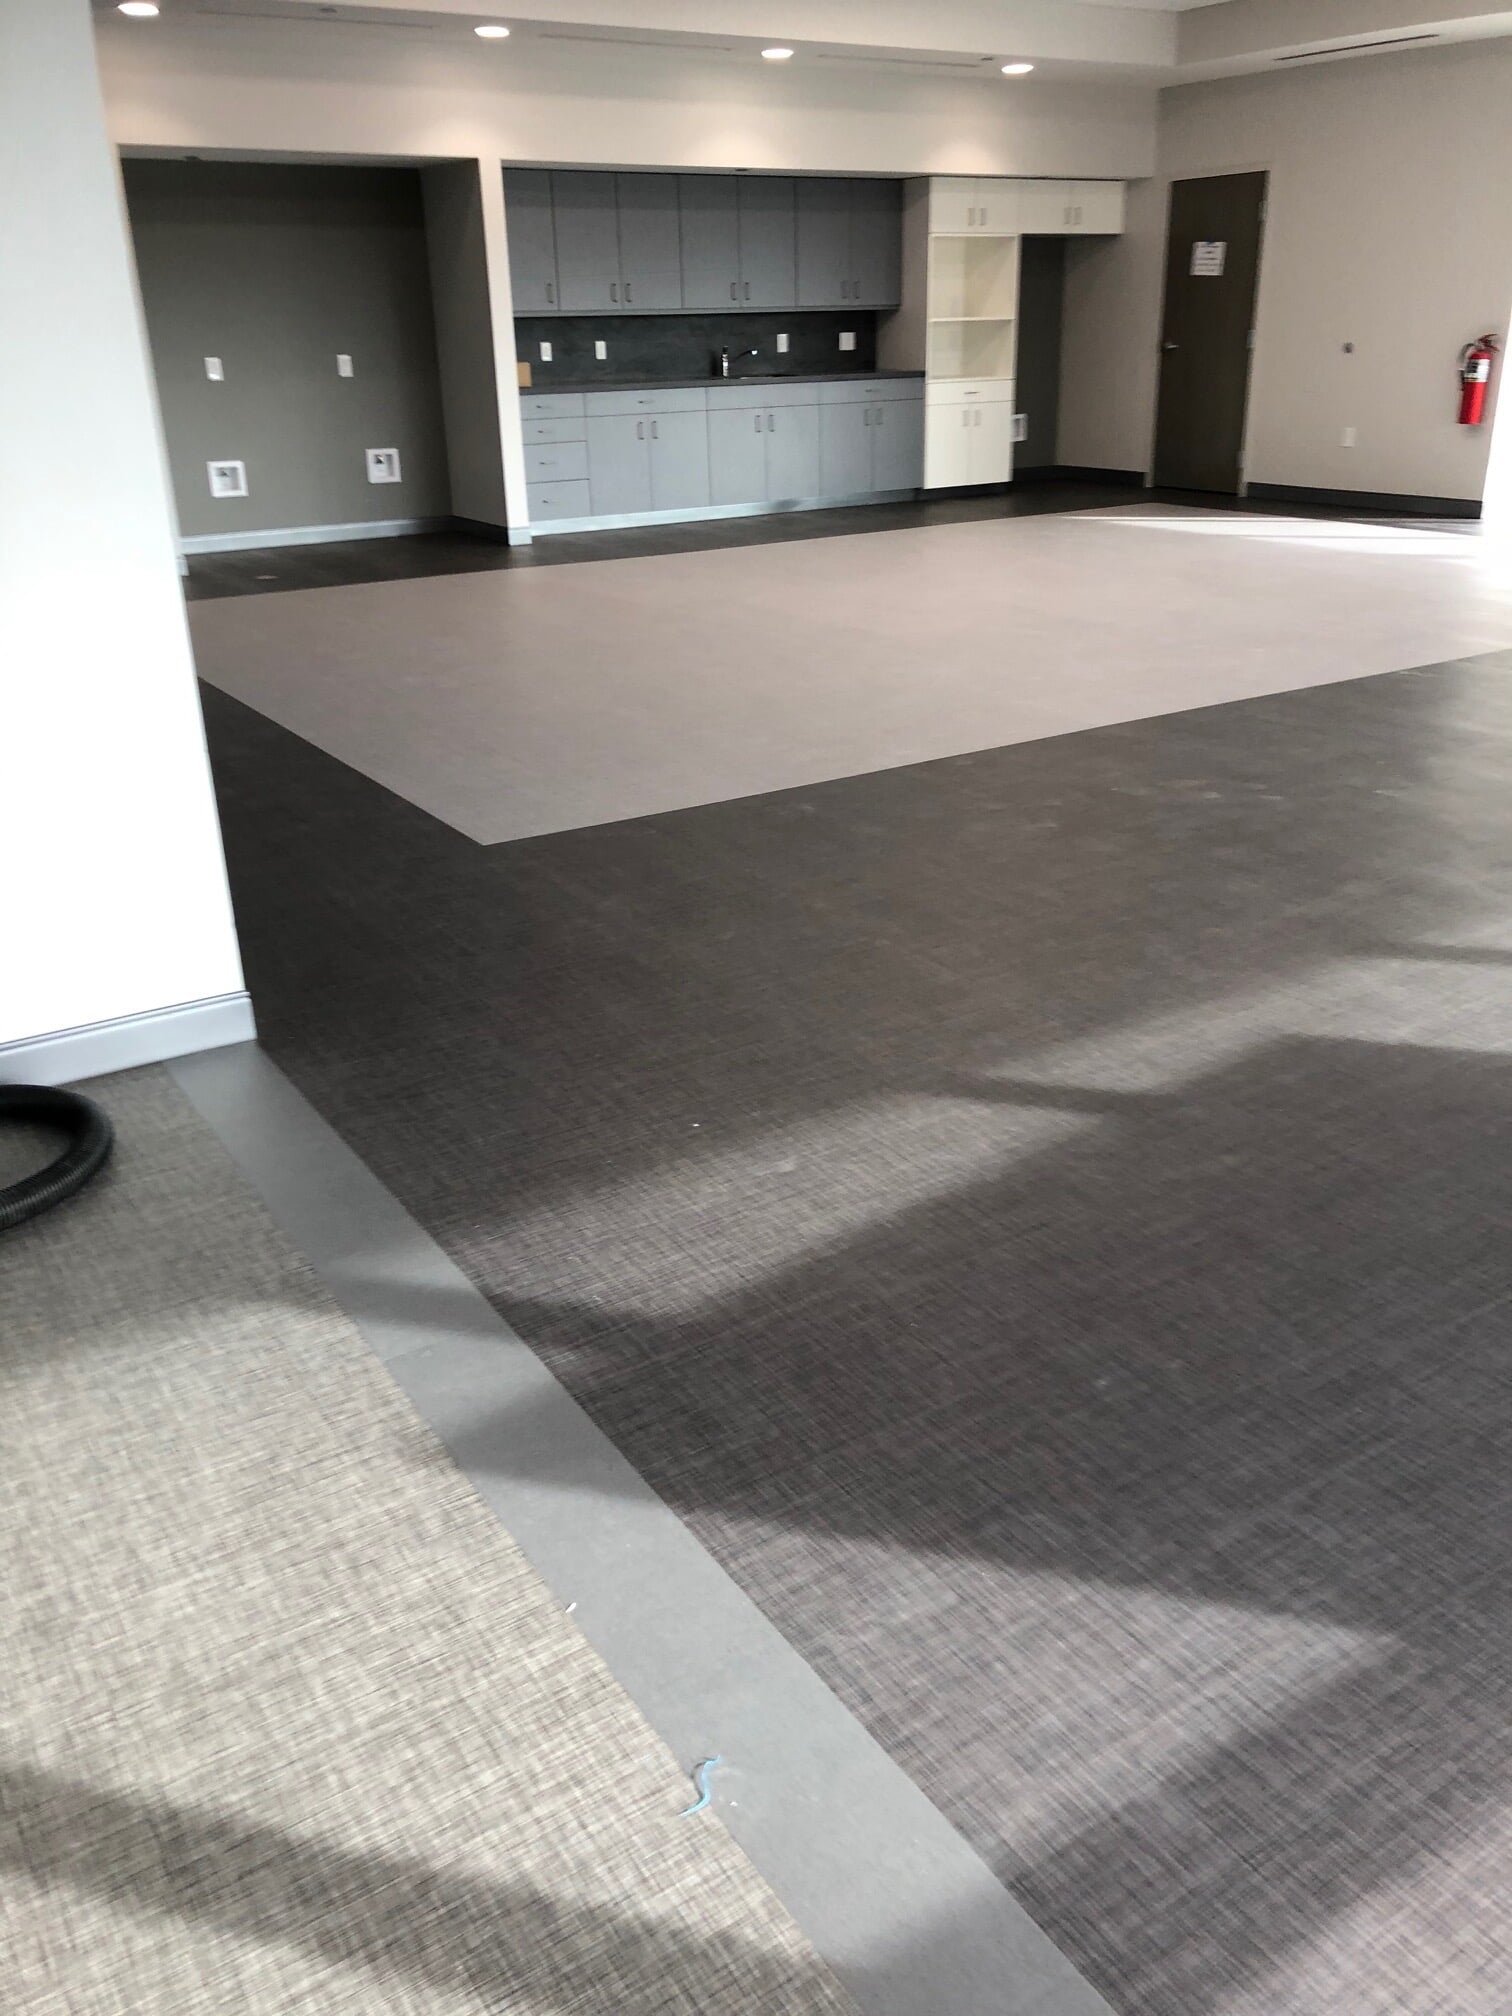 Durable commercial flooring in  from Barrington Carpet & Flooring Design